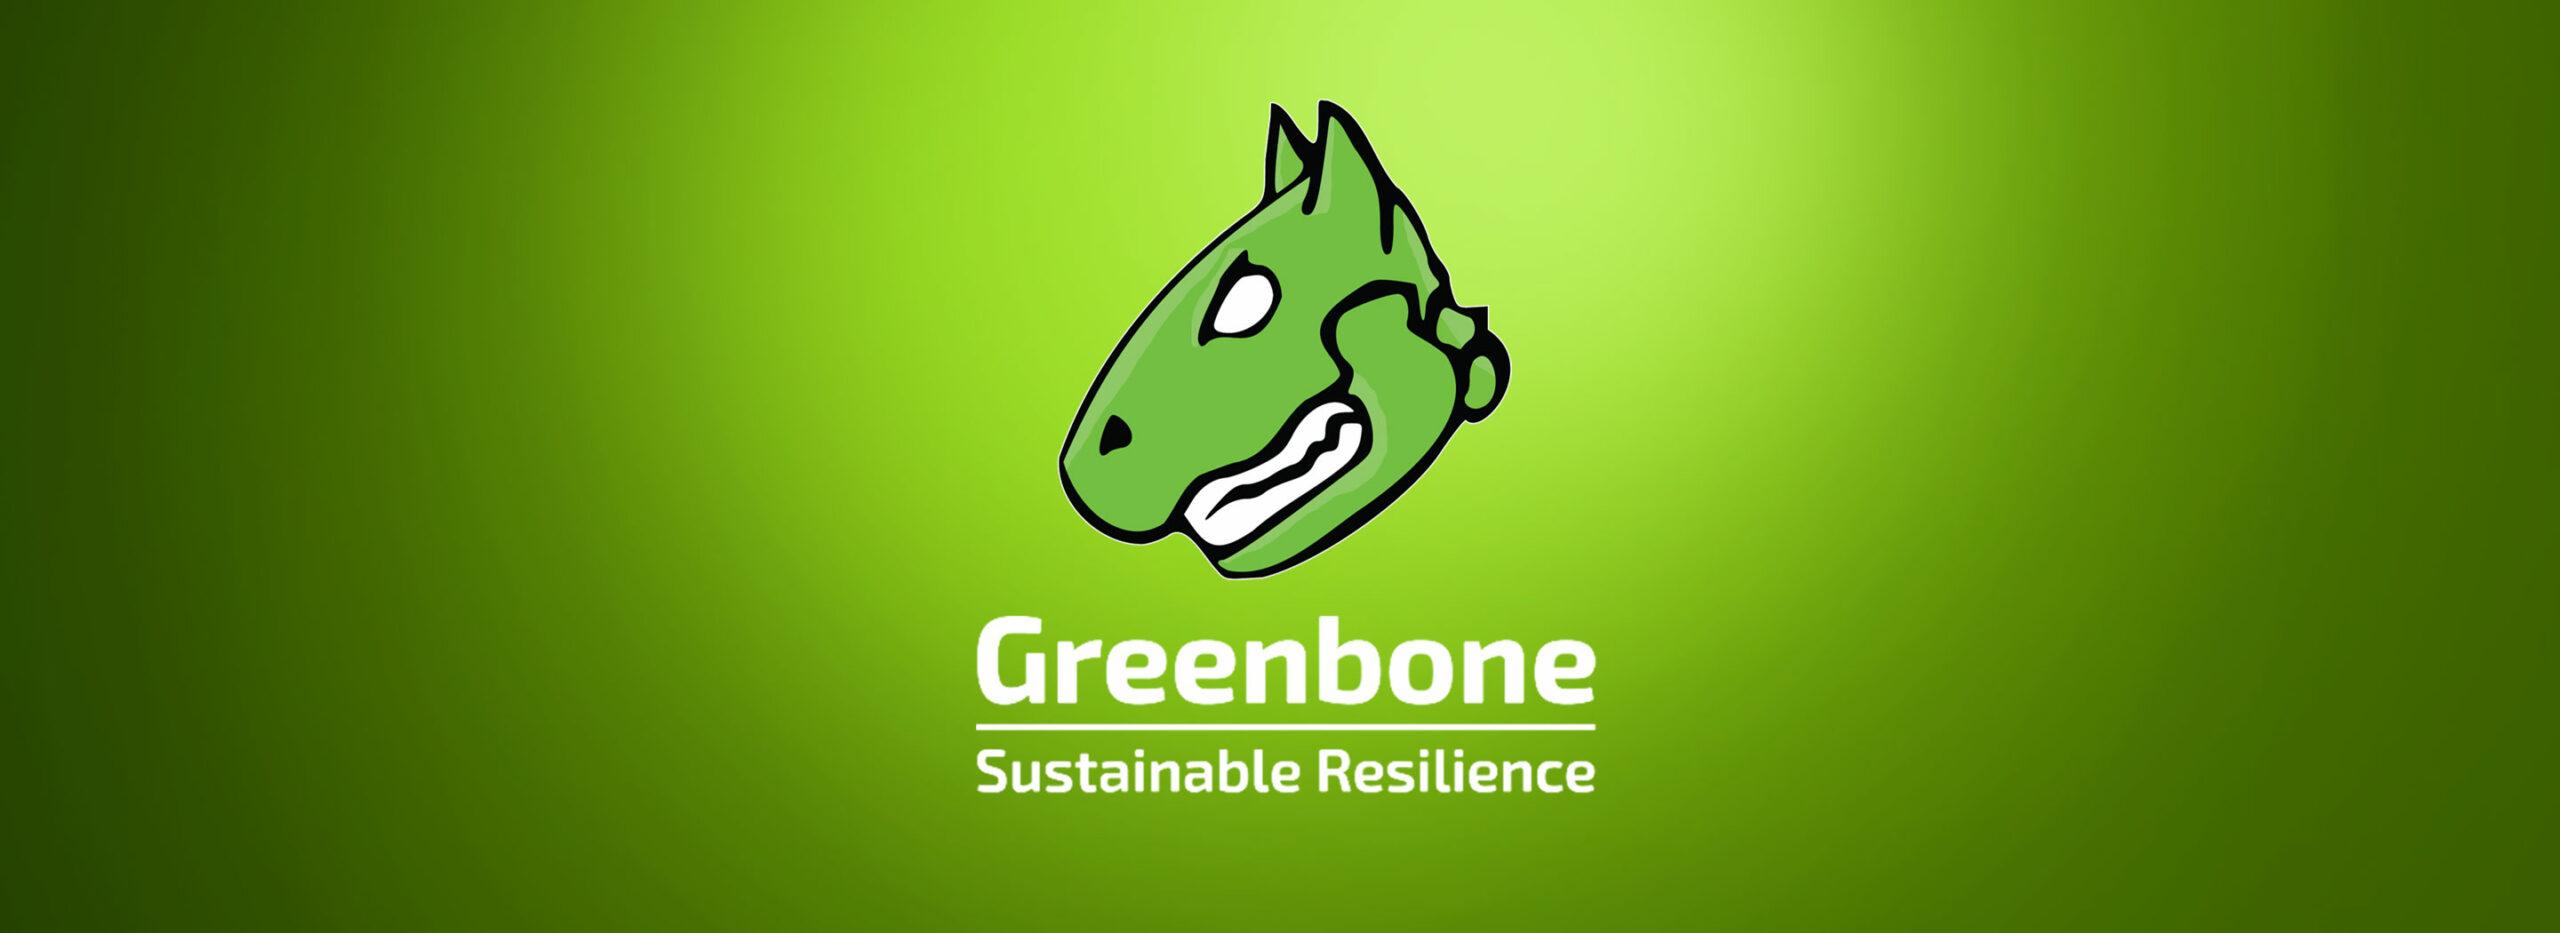 Raab IT Systemhaus Gerstetten | Blog | Greenbone